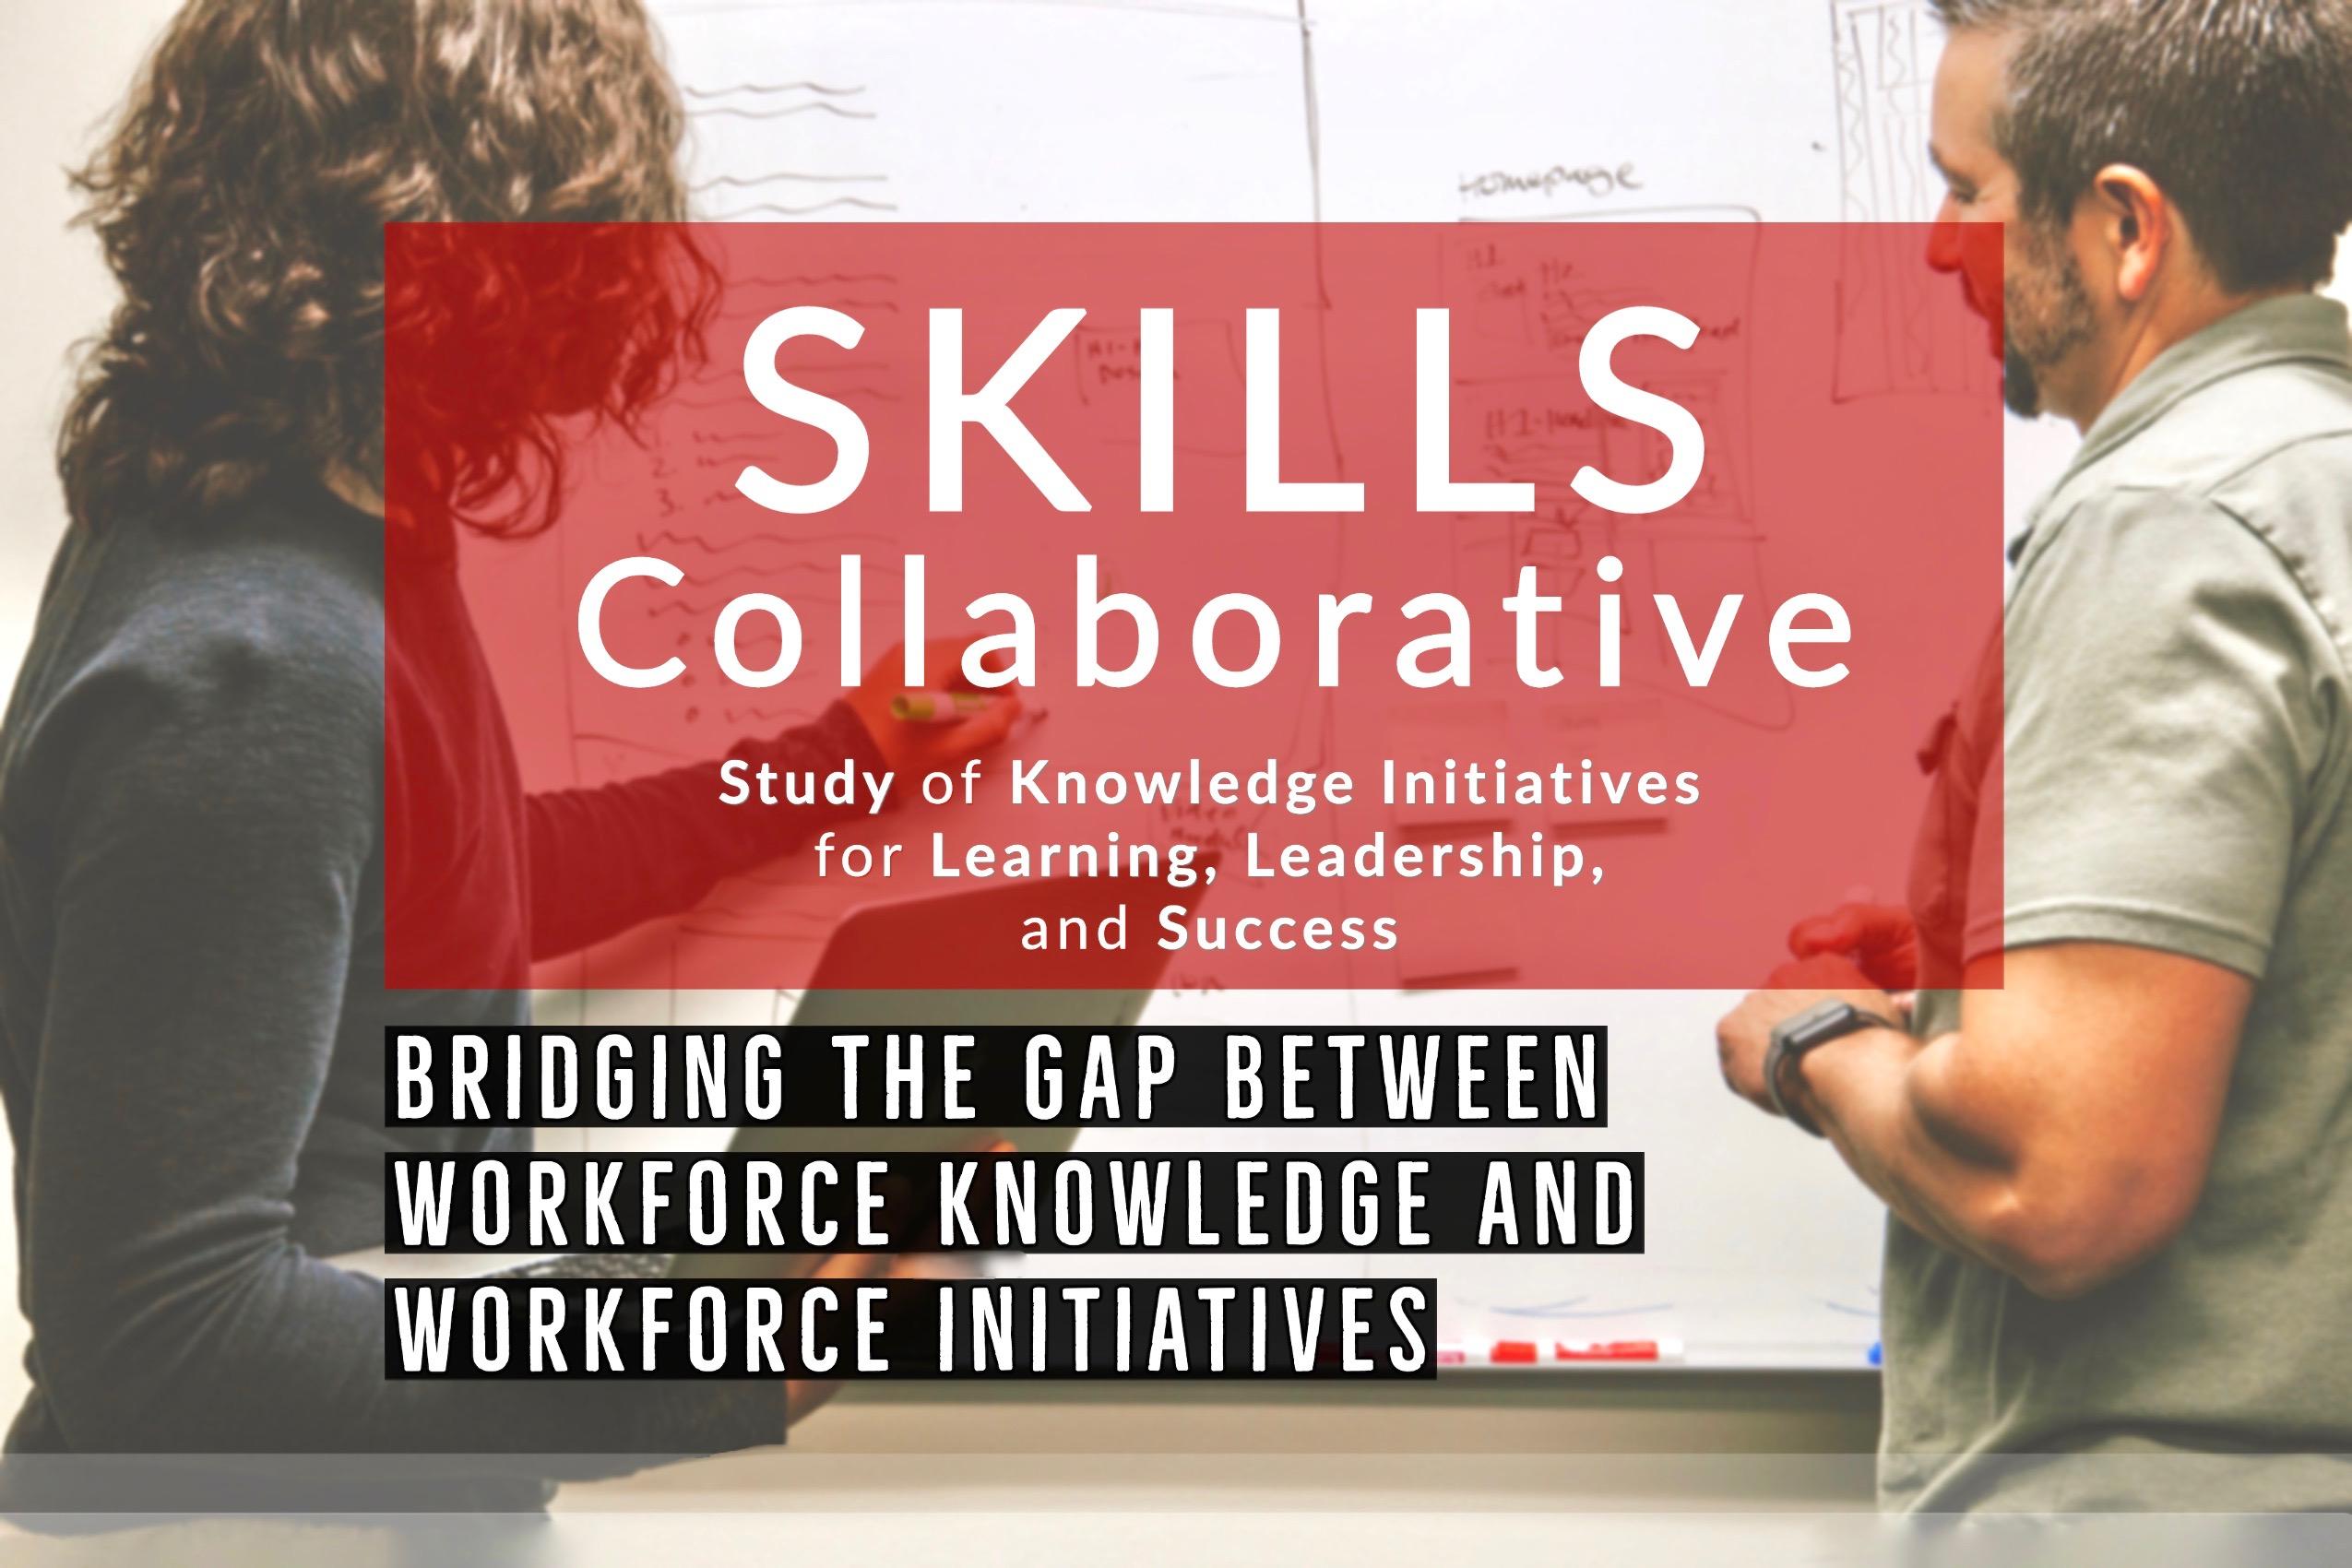 Skills Collaborative